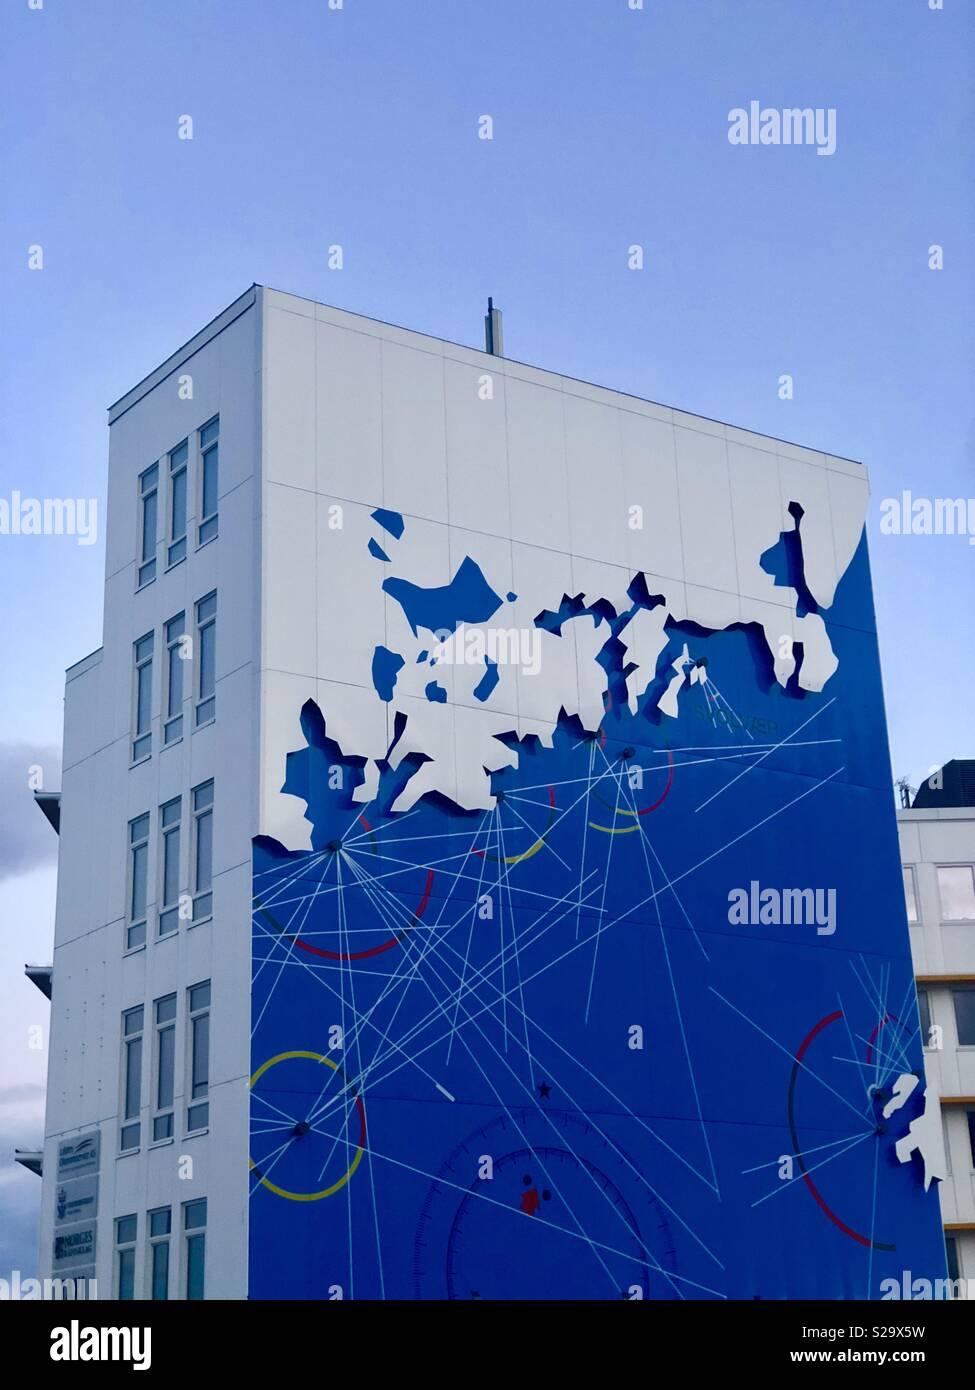 Stylish building located in Svolvær (Lofoten Islands, Norway) - Stock Image